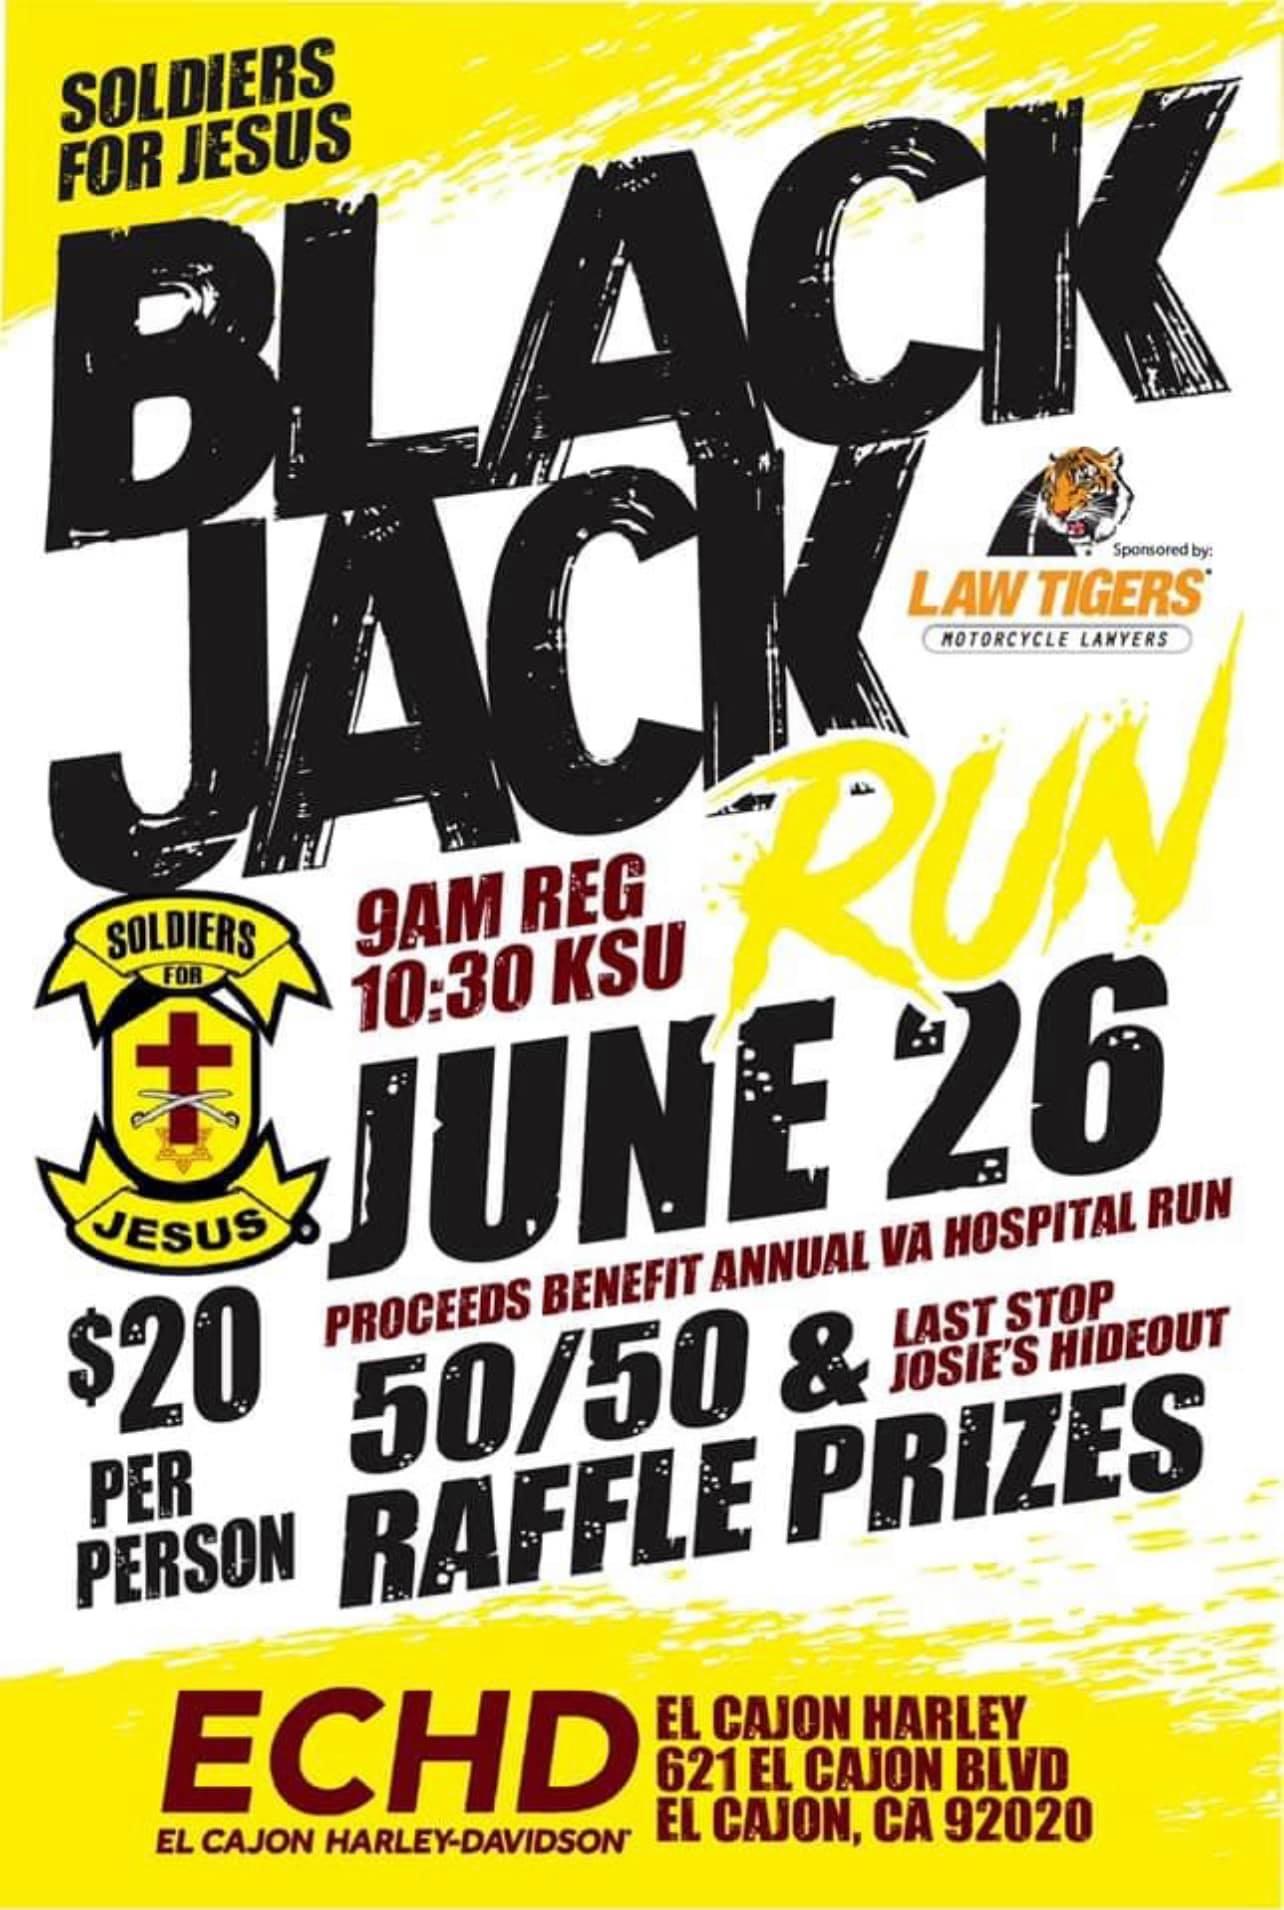 Soldier's For Jesus Black Jack Run